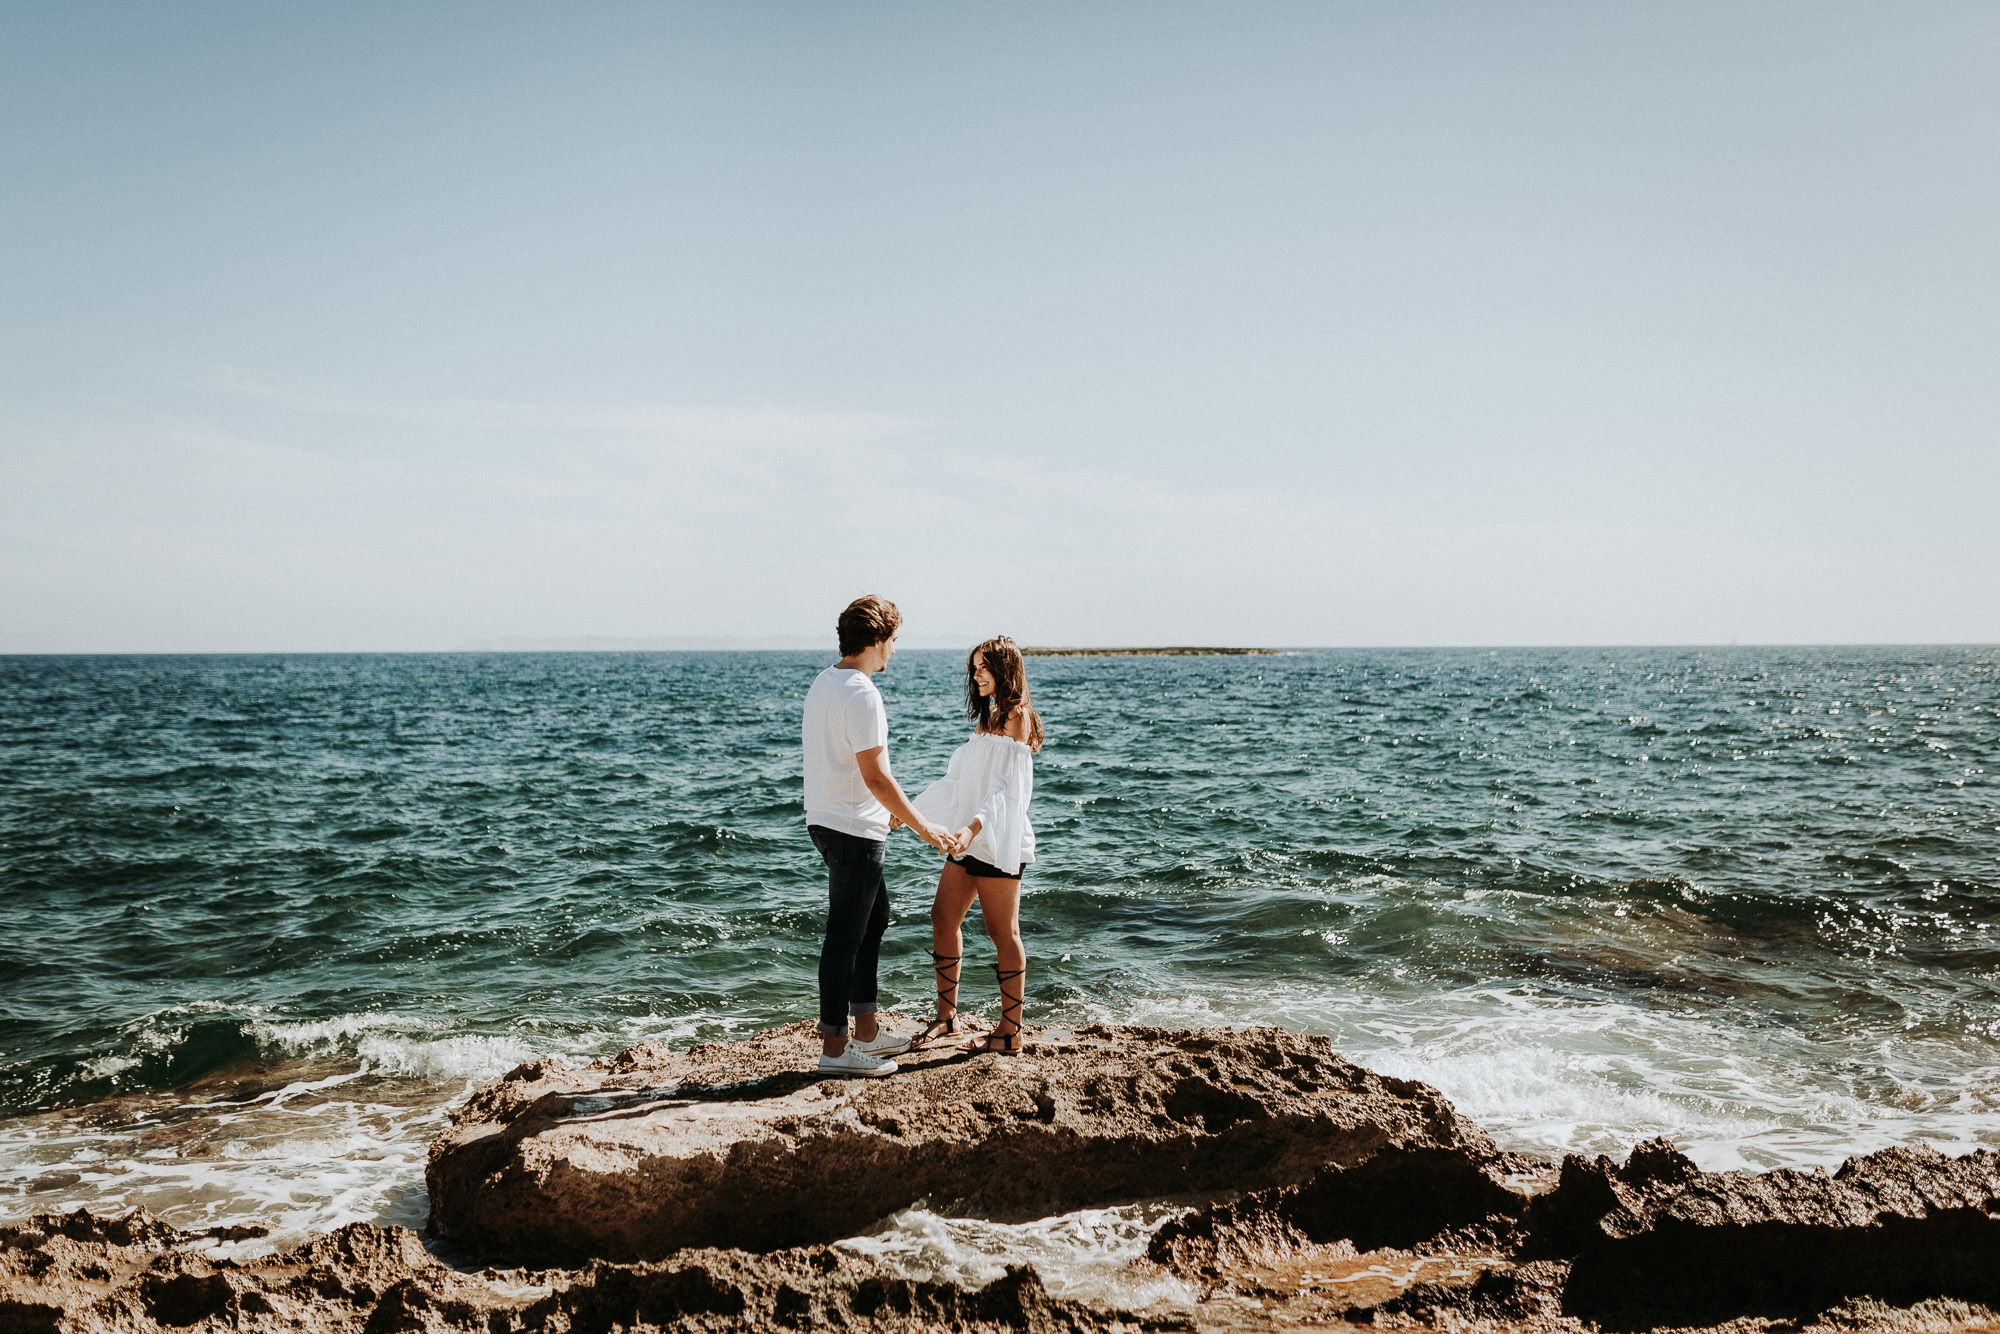 DanielaMarquardtPhotography_wedding_elopement_mallorca_spain_stjordi_sessalines_marinaandxavi151